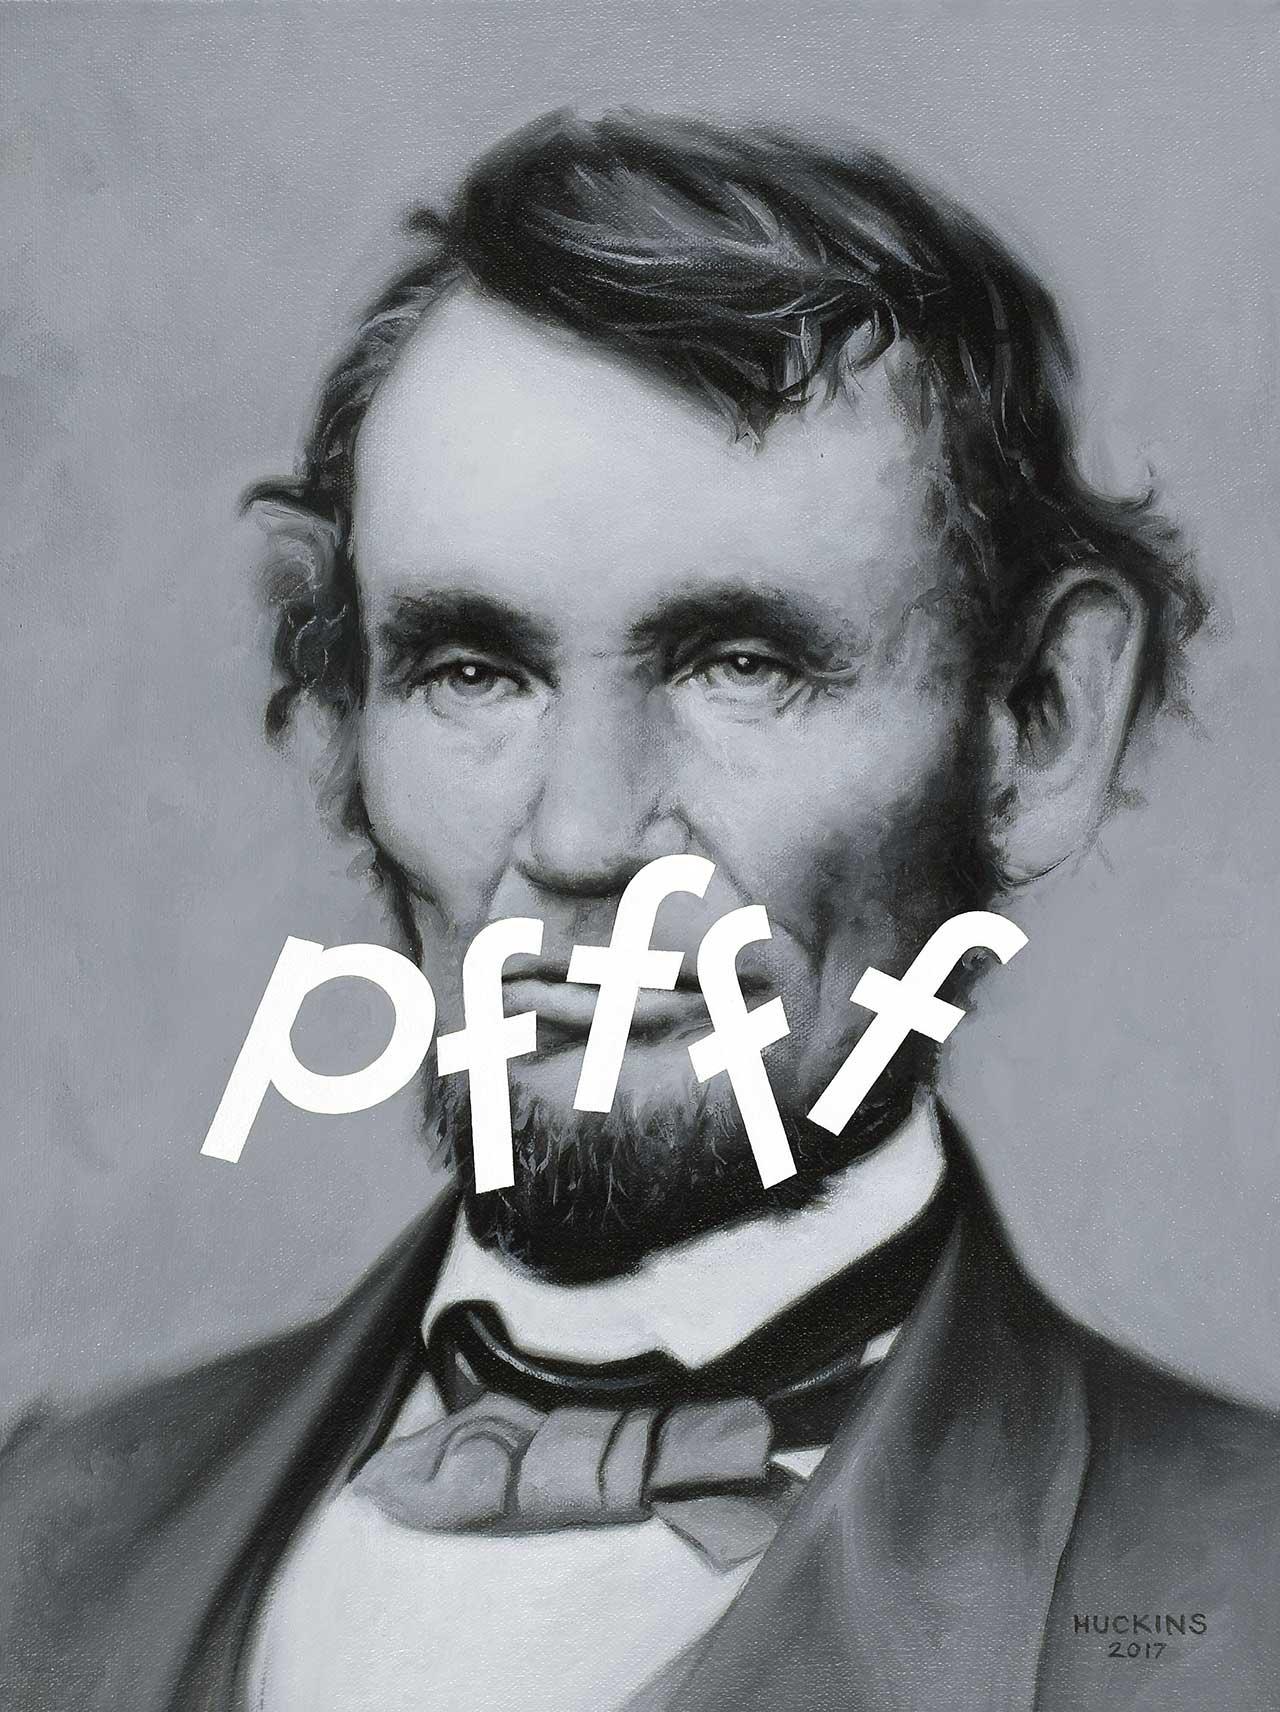 Abraham Lincoln: Pffff, 2017. Acrylic